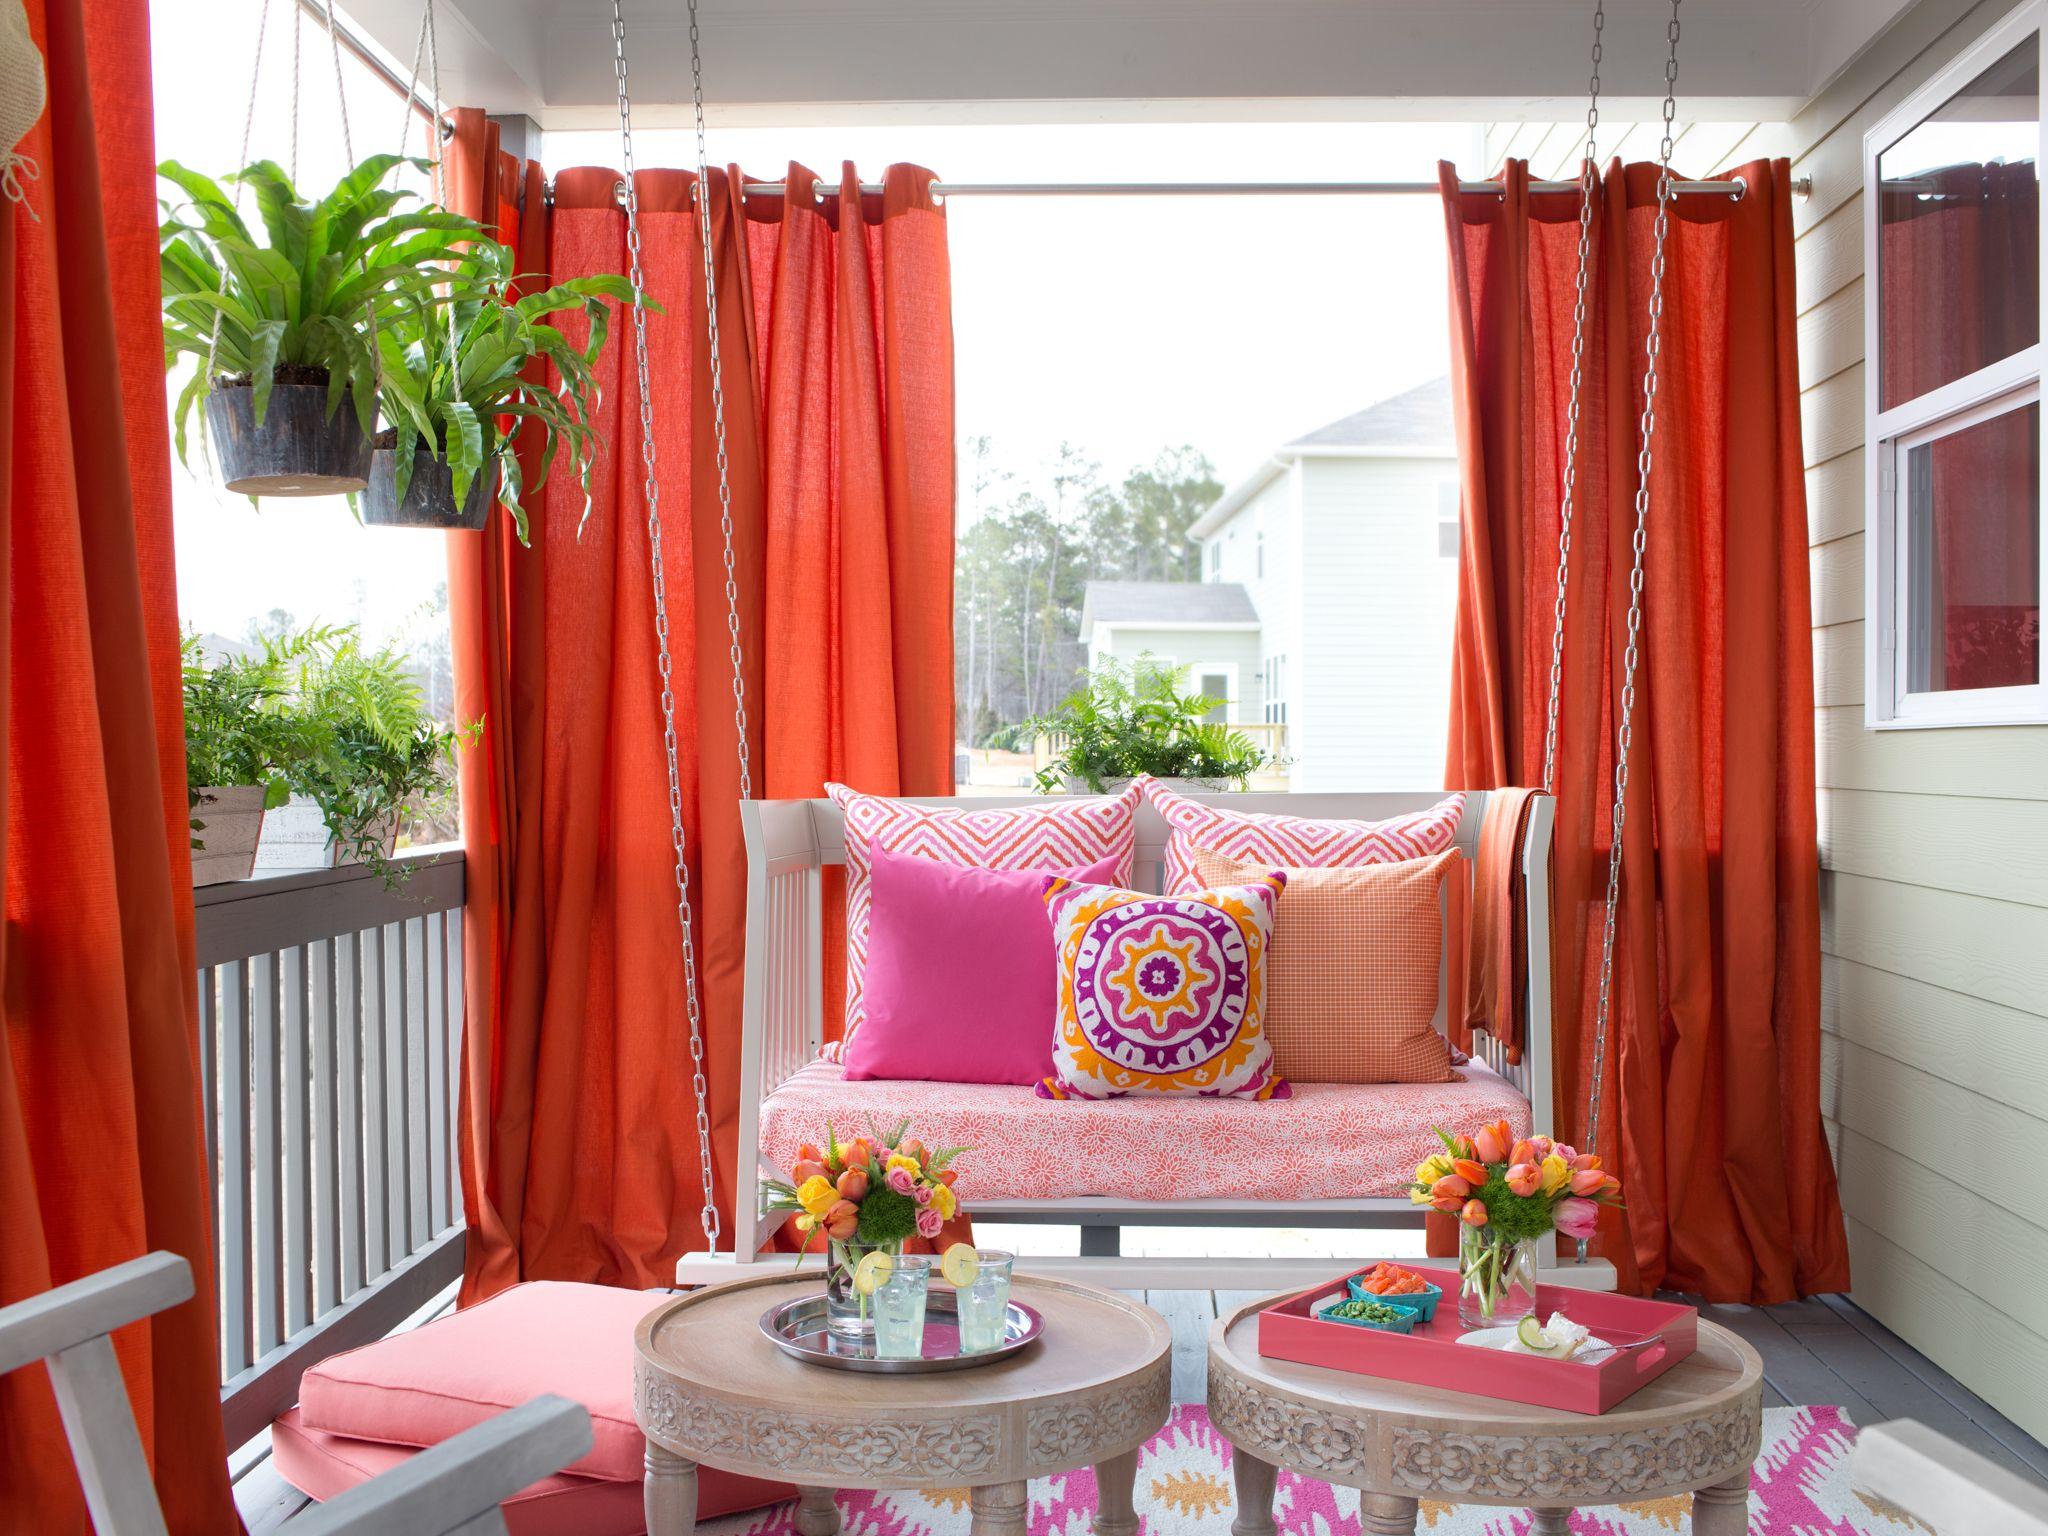 x dp amazon curtain com outdoor home w gazebo kitchen panels l grommet aqua panel